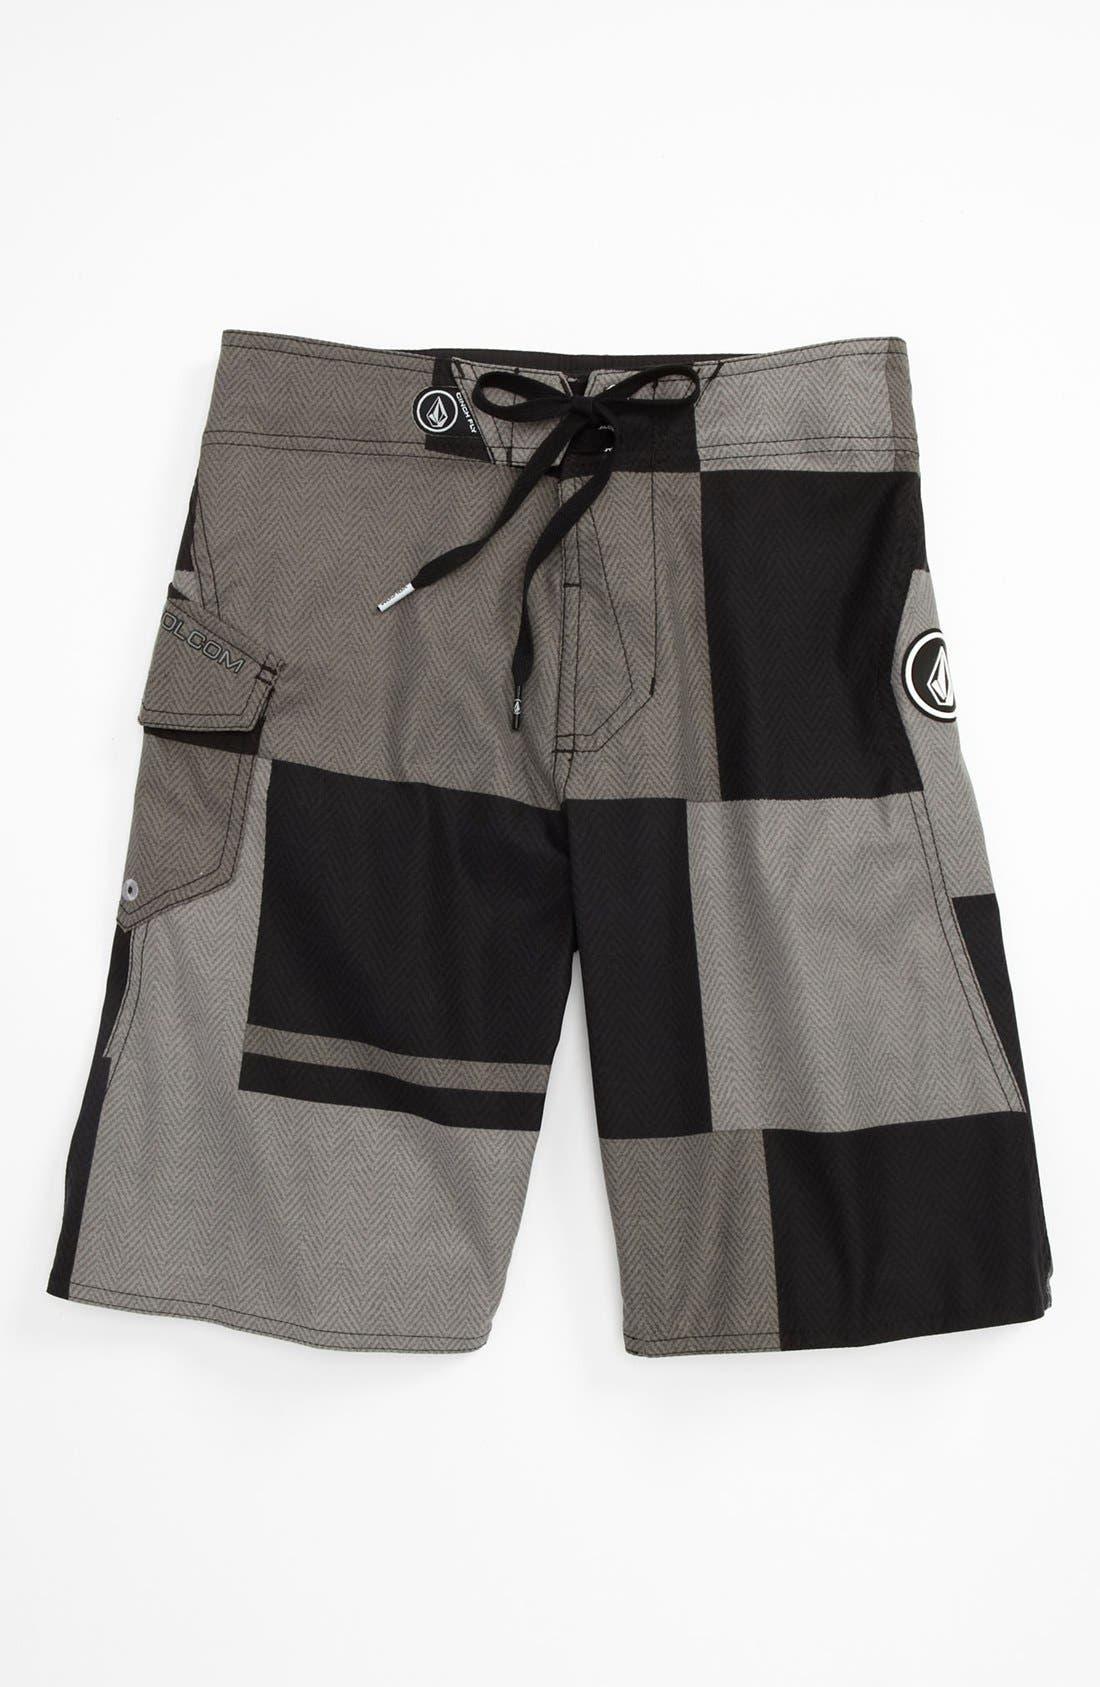 Main Image - Volcom 'Maguro' Colorblocked Board Shorts (Big Boys)